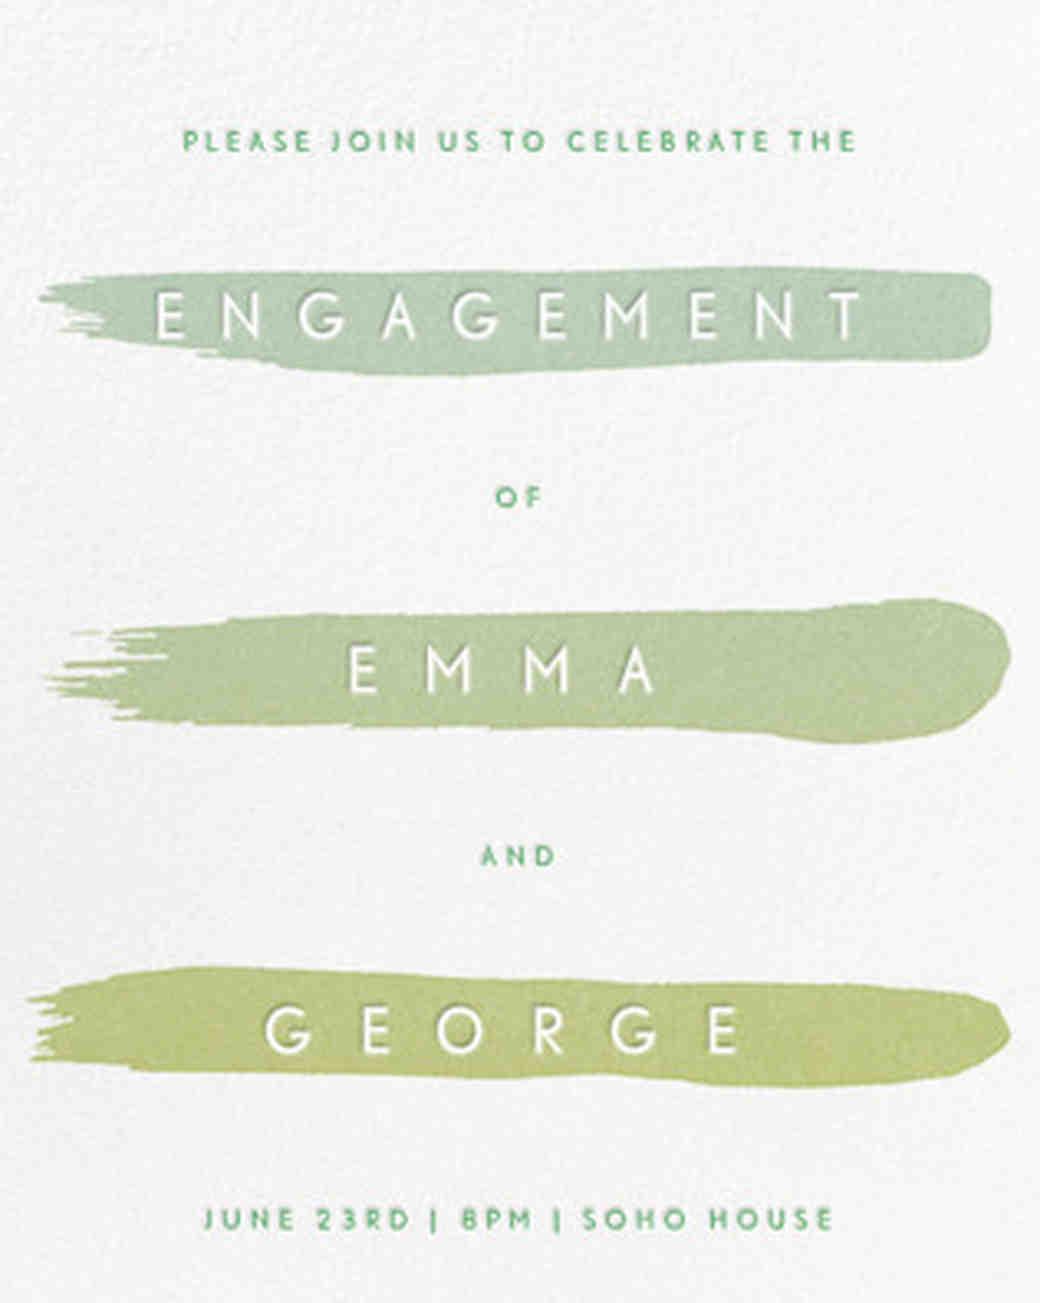 paperless-engagement-party-invitations-paperless-post-brushstrokes-0416.jpg